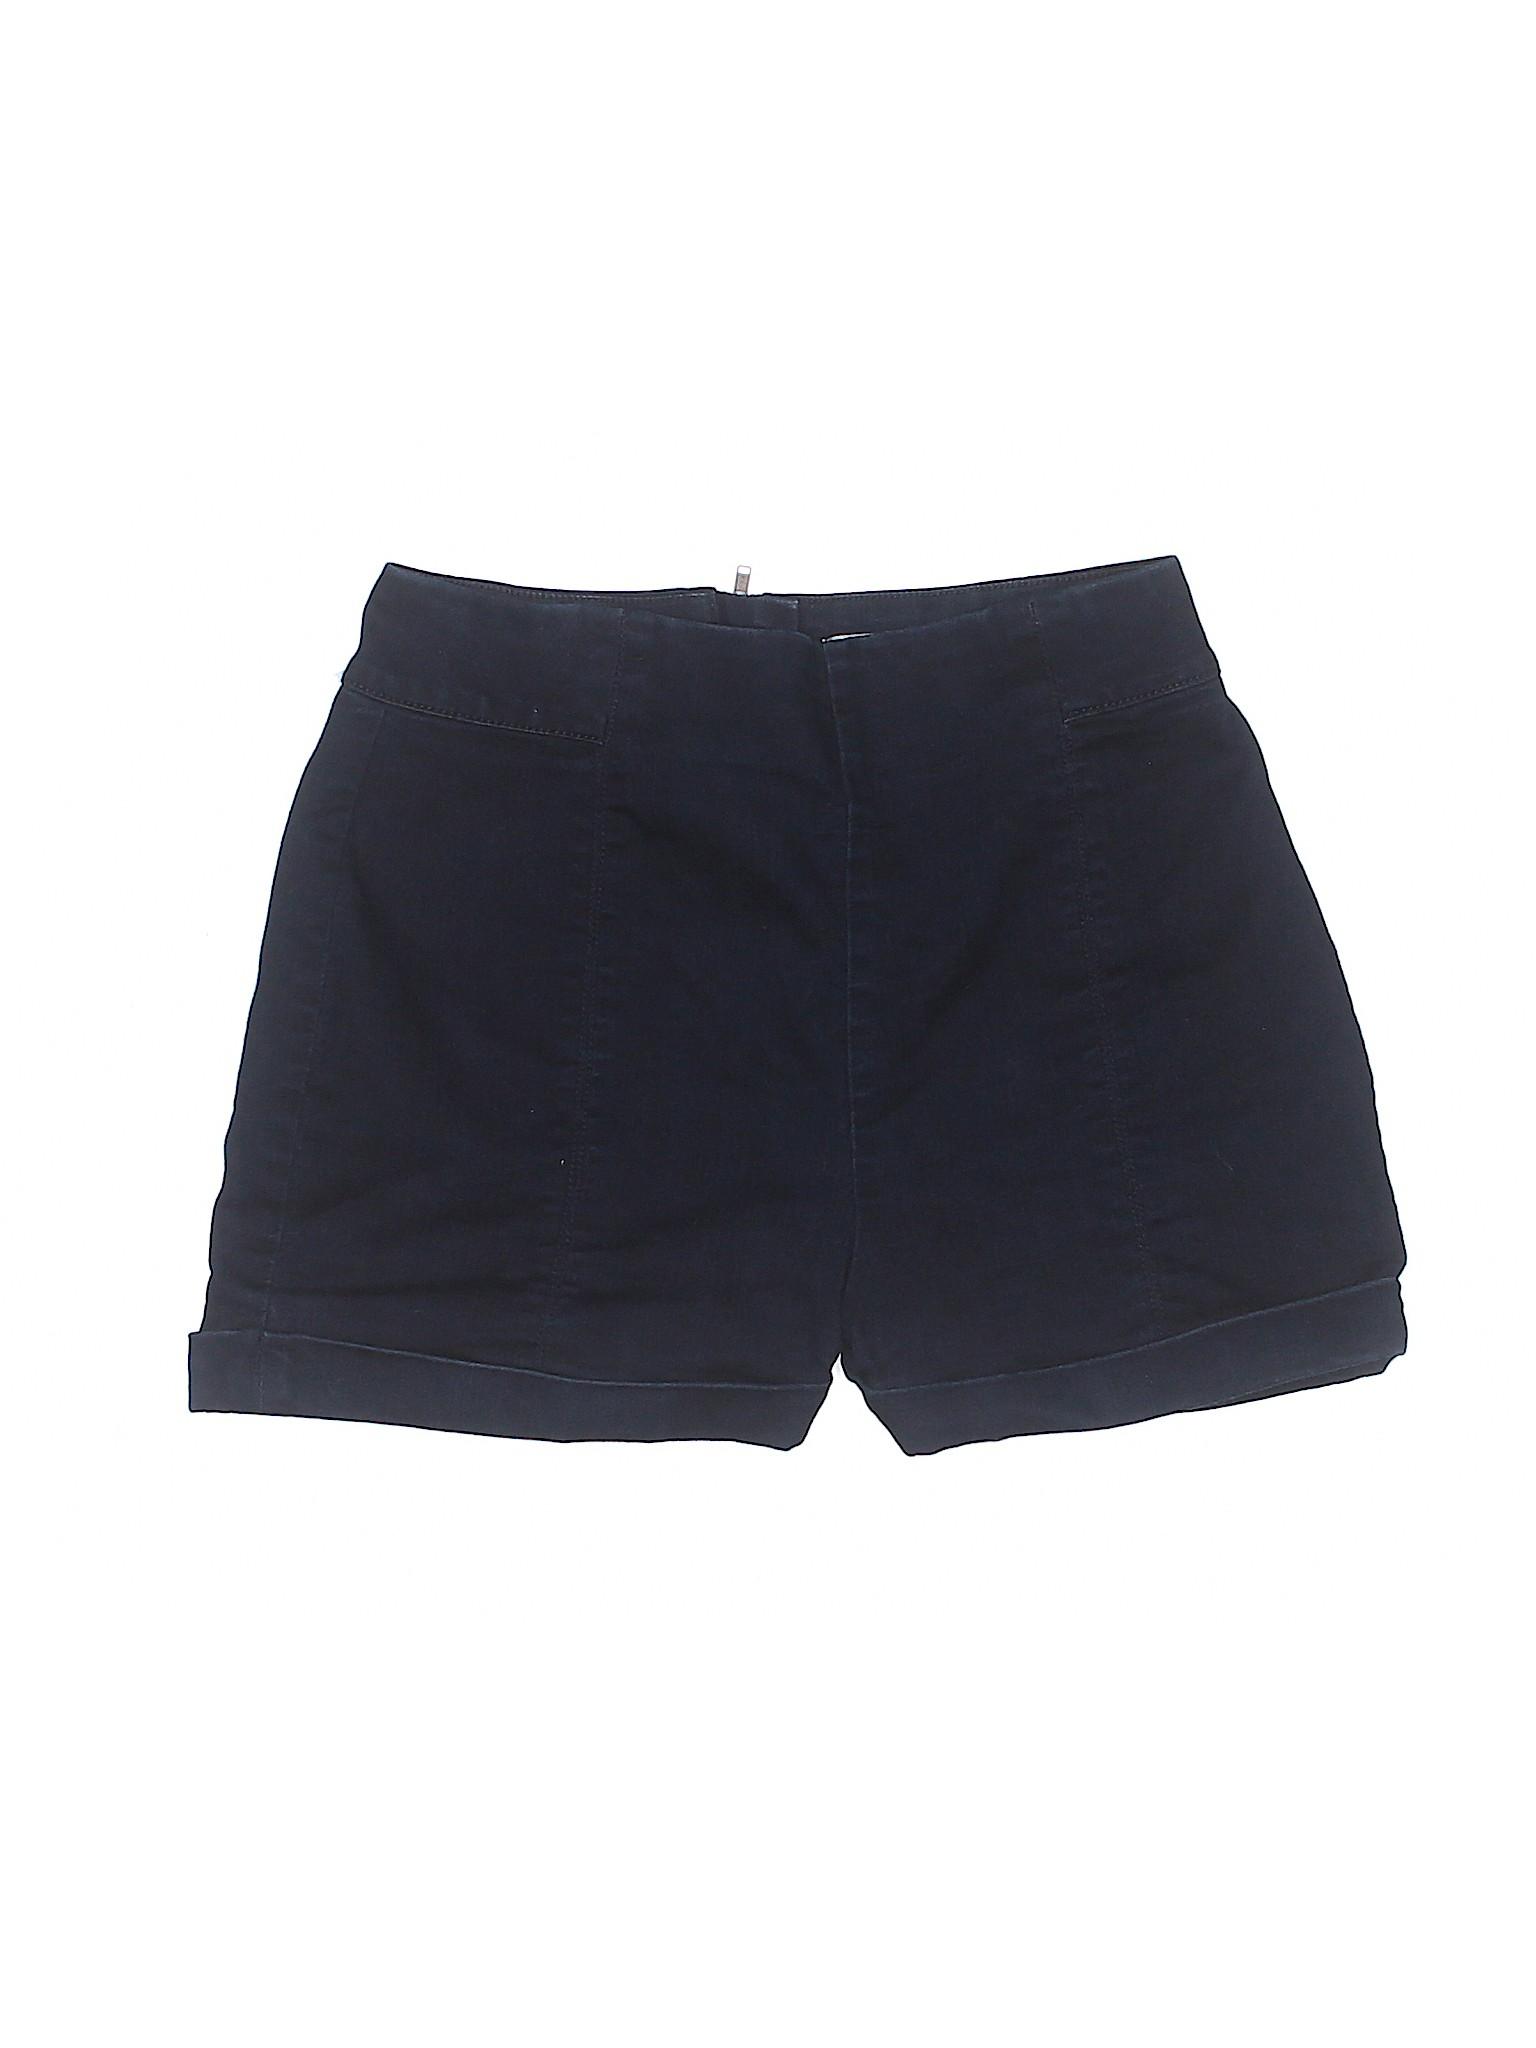 Boutique Cooperative Denim Boutique Cooperative Shorts Denim q5gwYZY